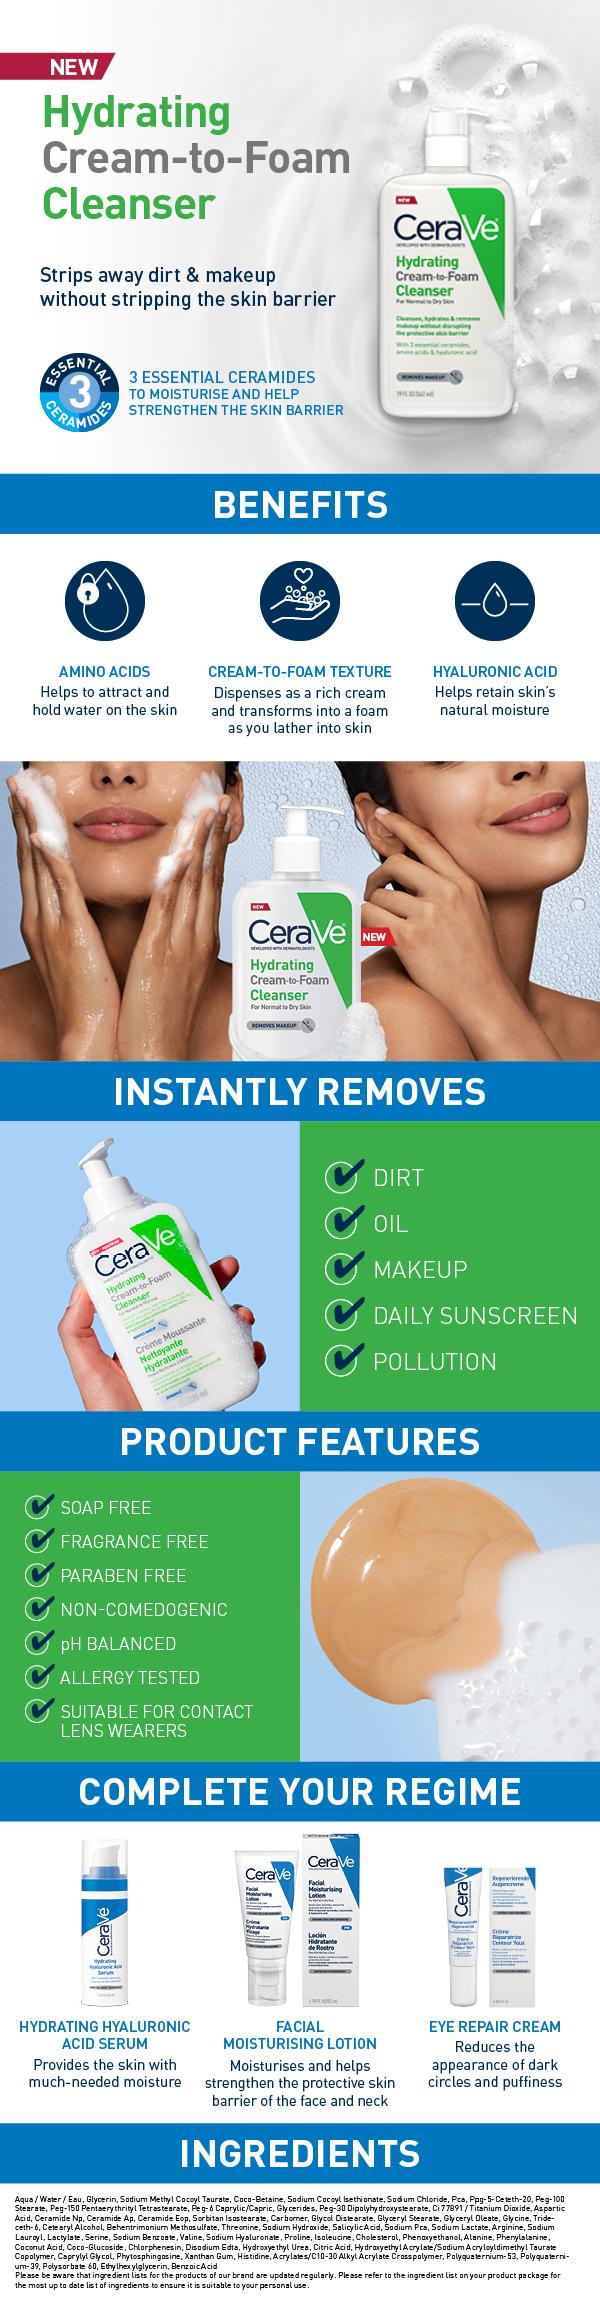 CeraVe Hydrating Cream